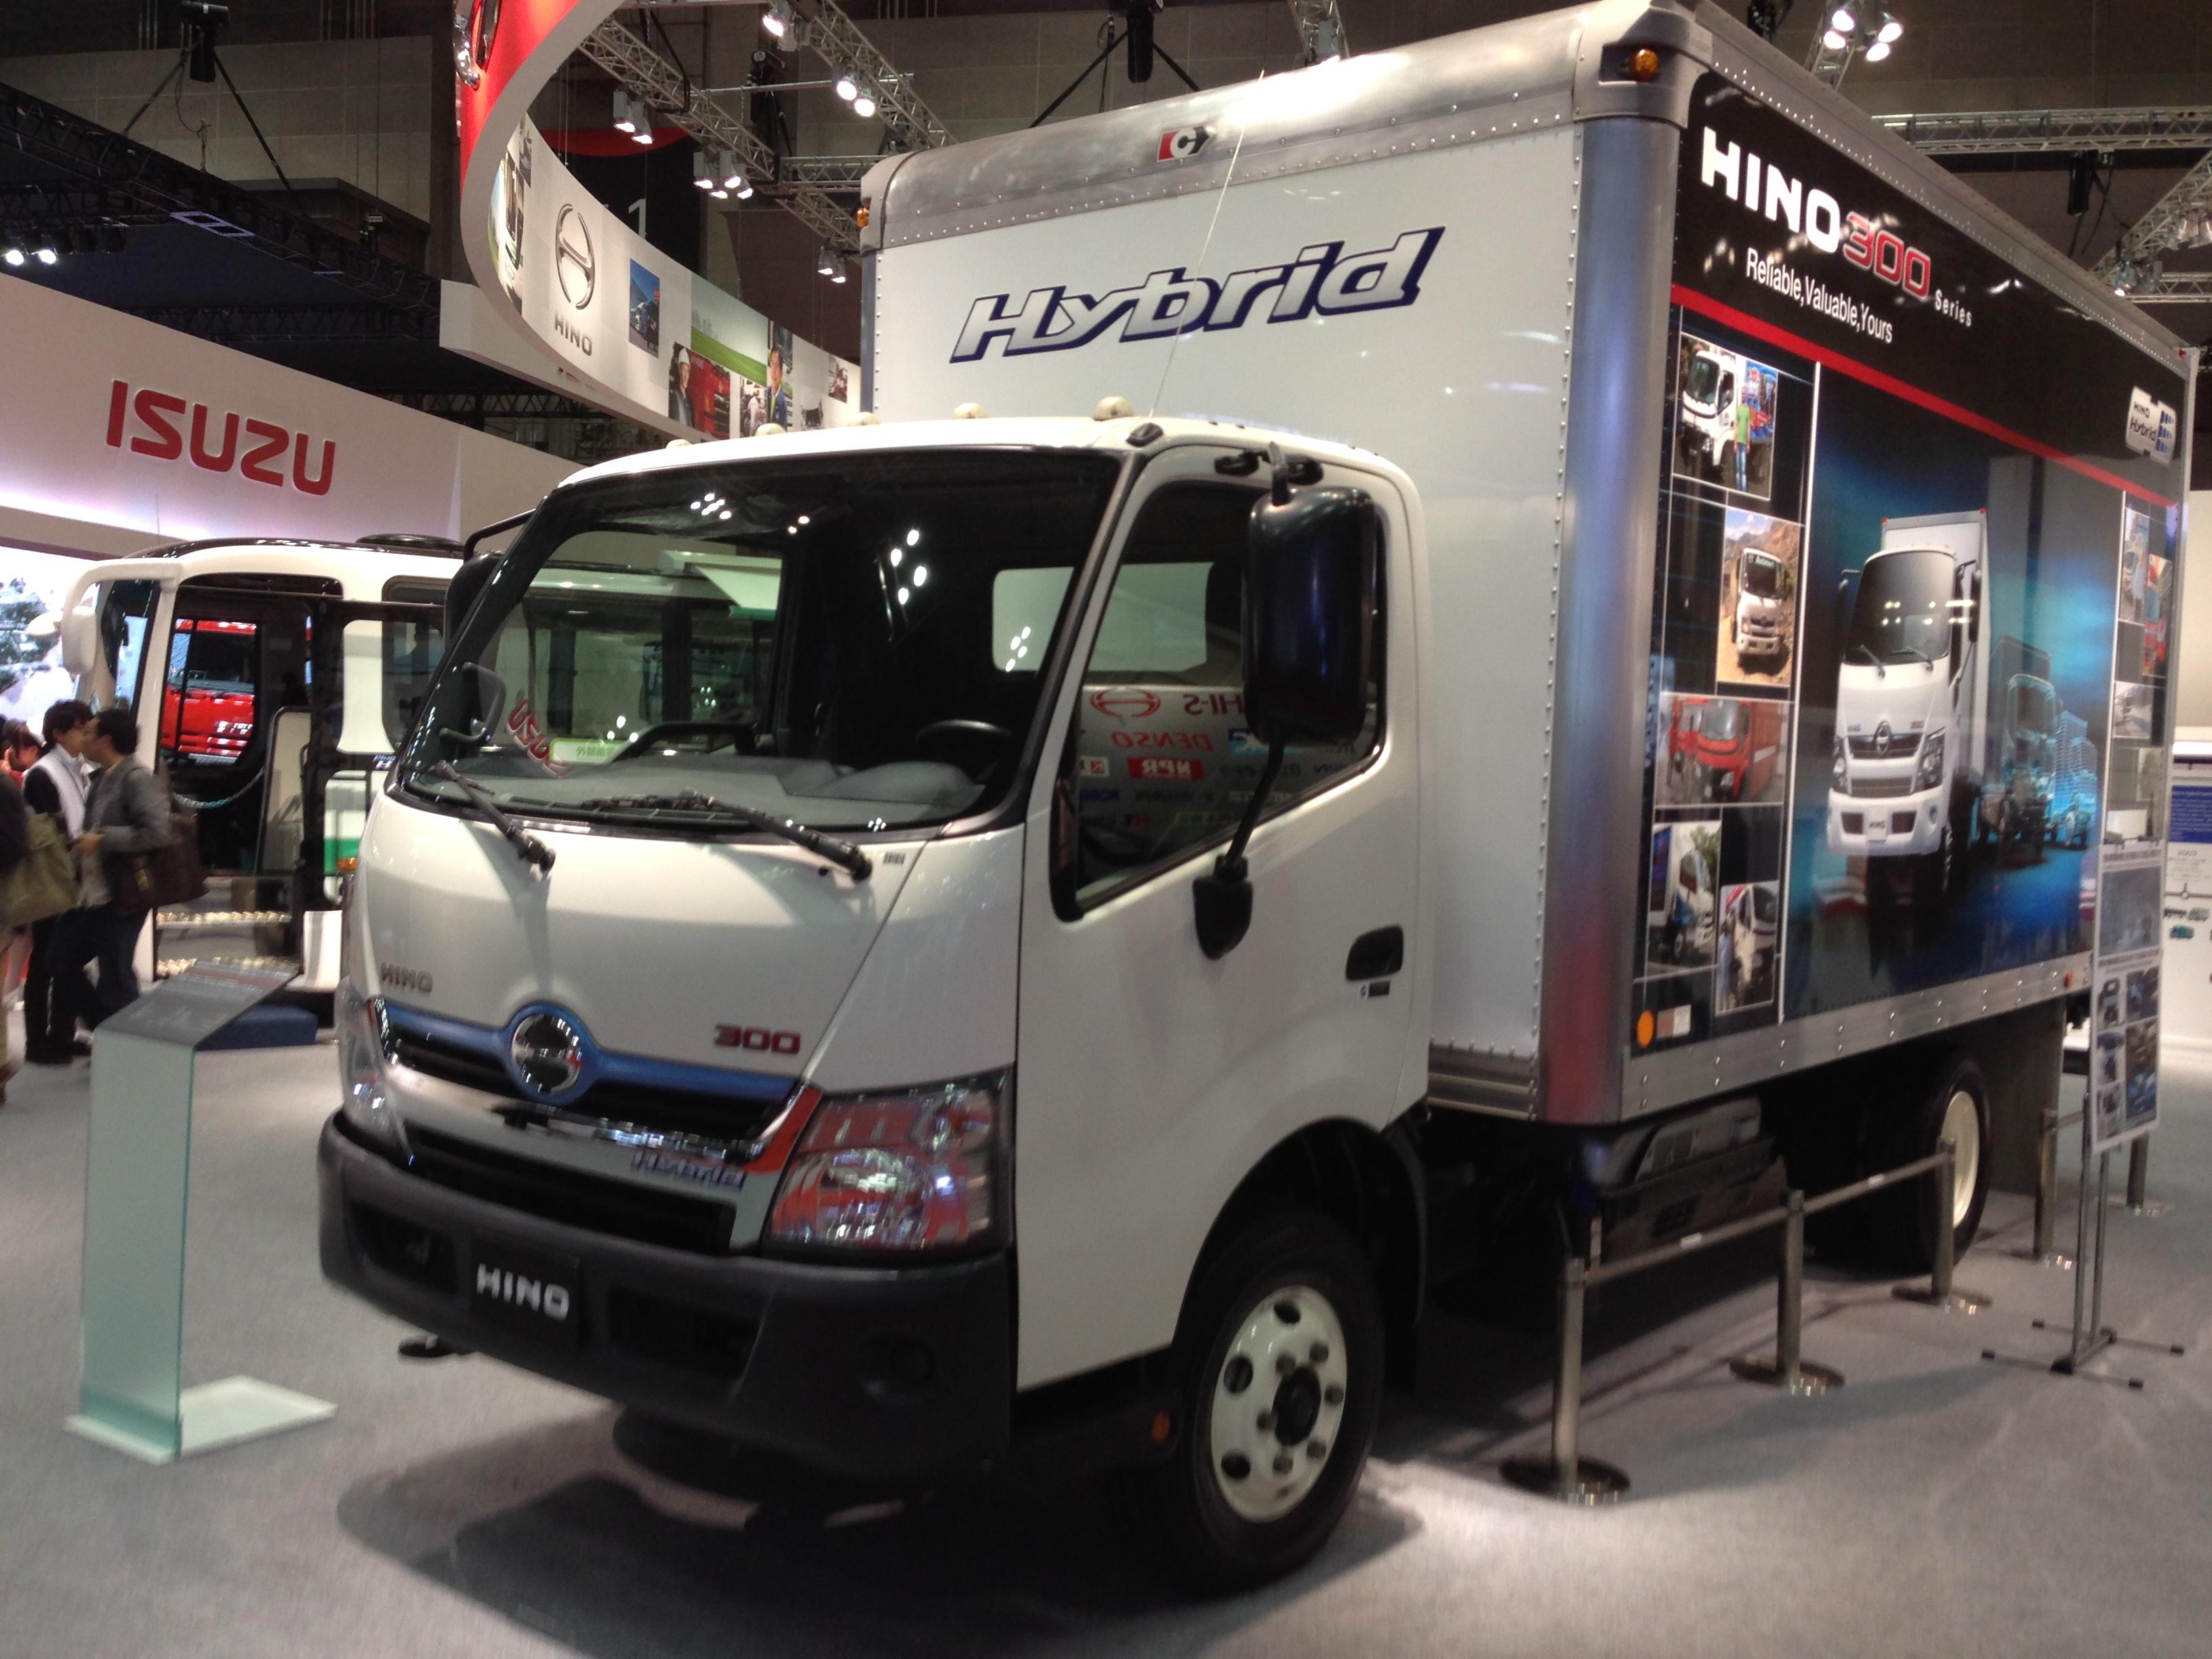 Hino Motors - Wikipedia